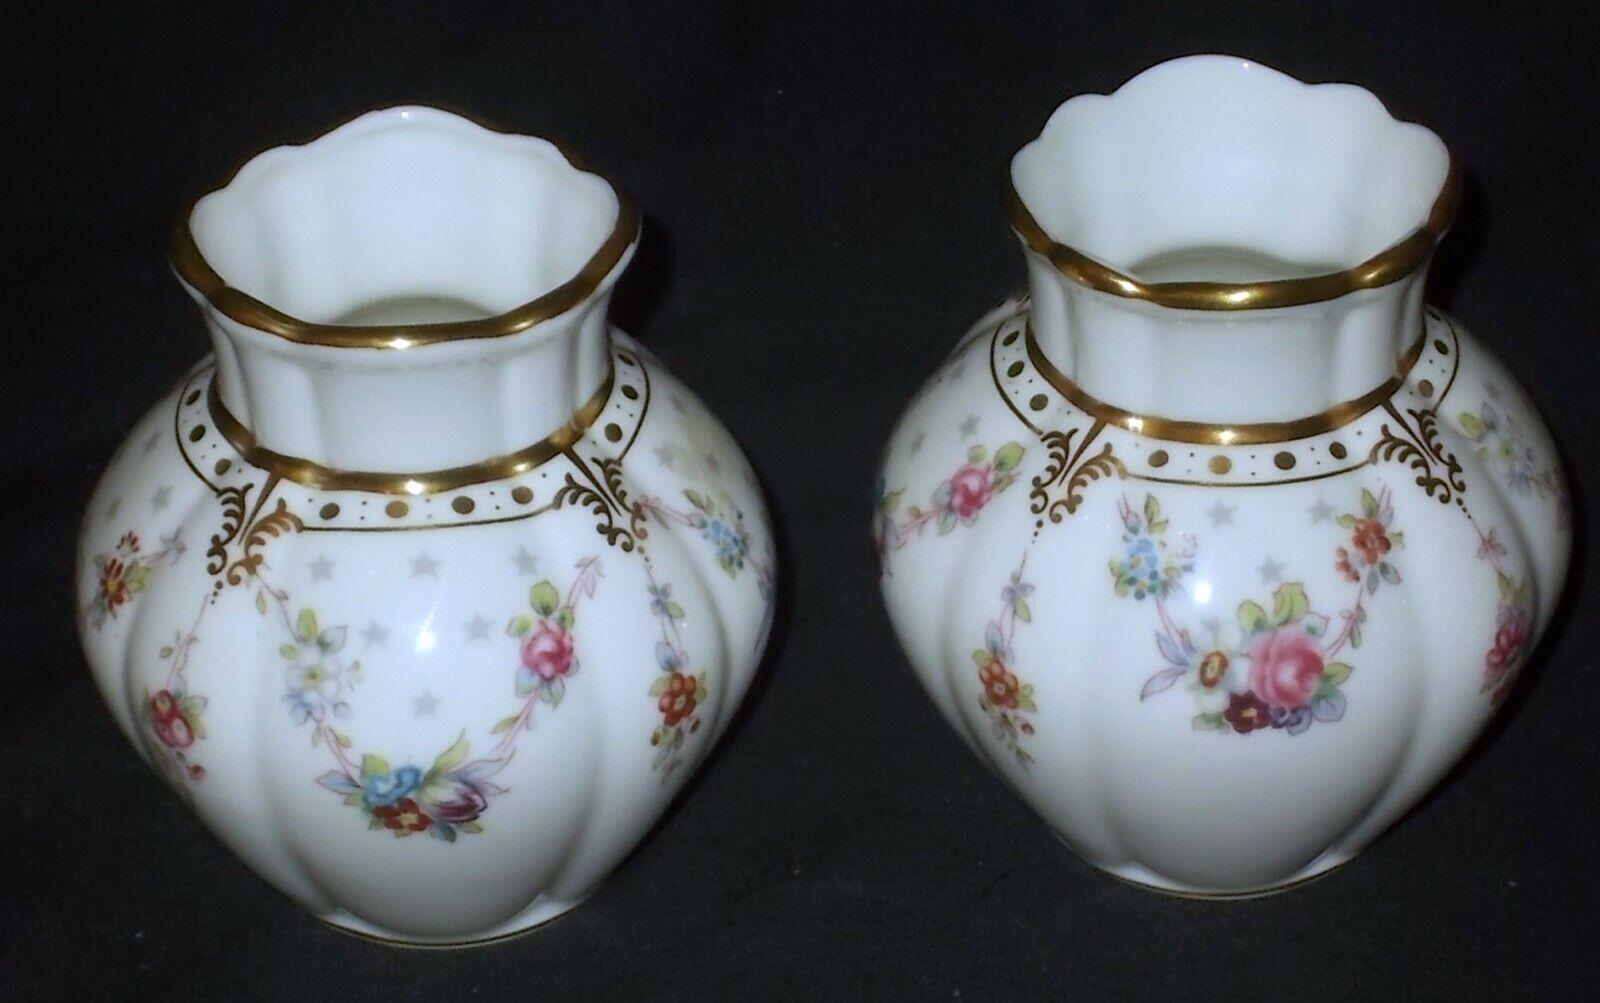 Image 1 - TWO Royal Crown Derby ROYAL ANTOINETTE Viola Vases